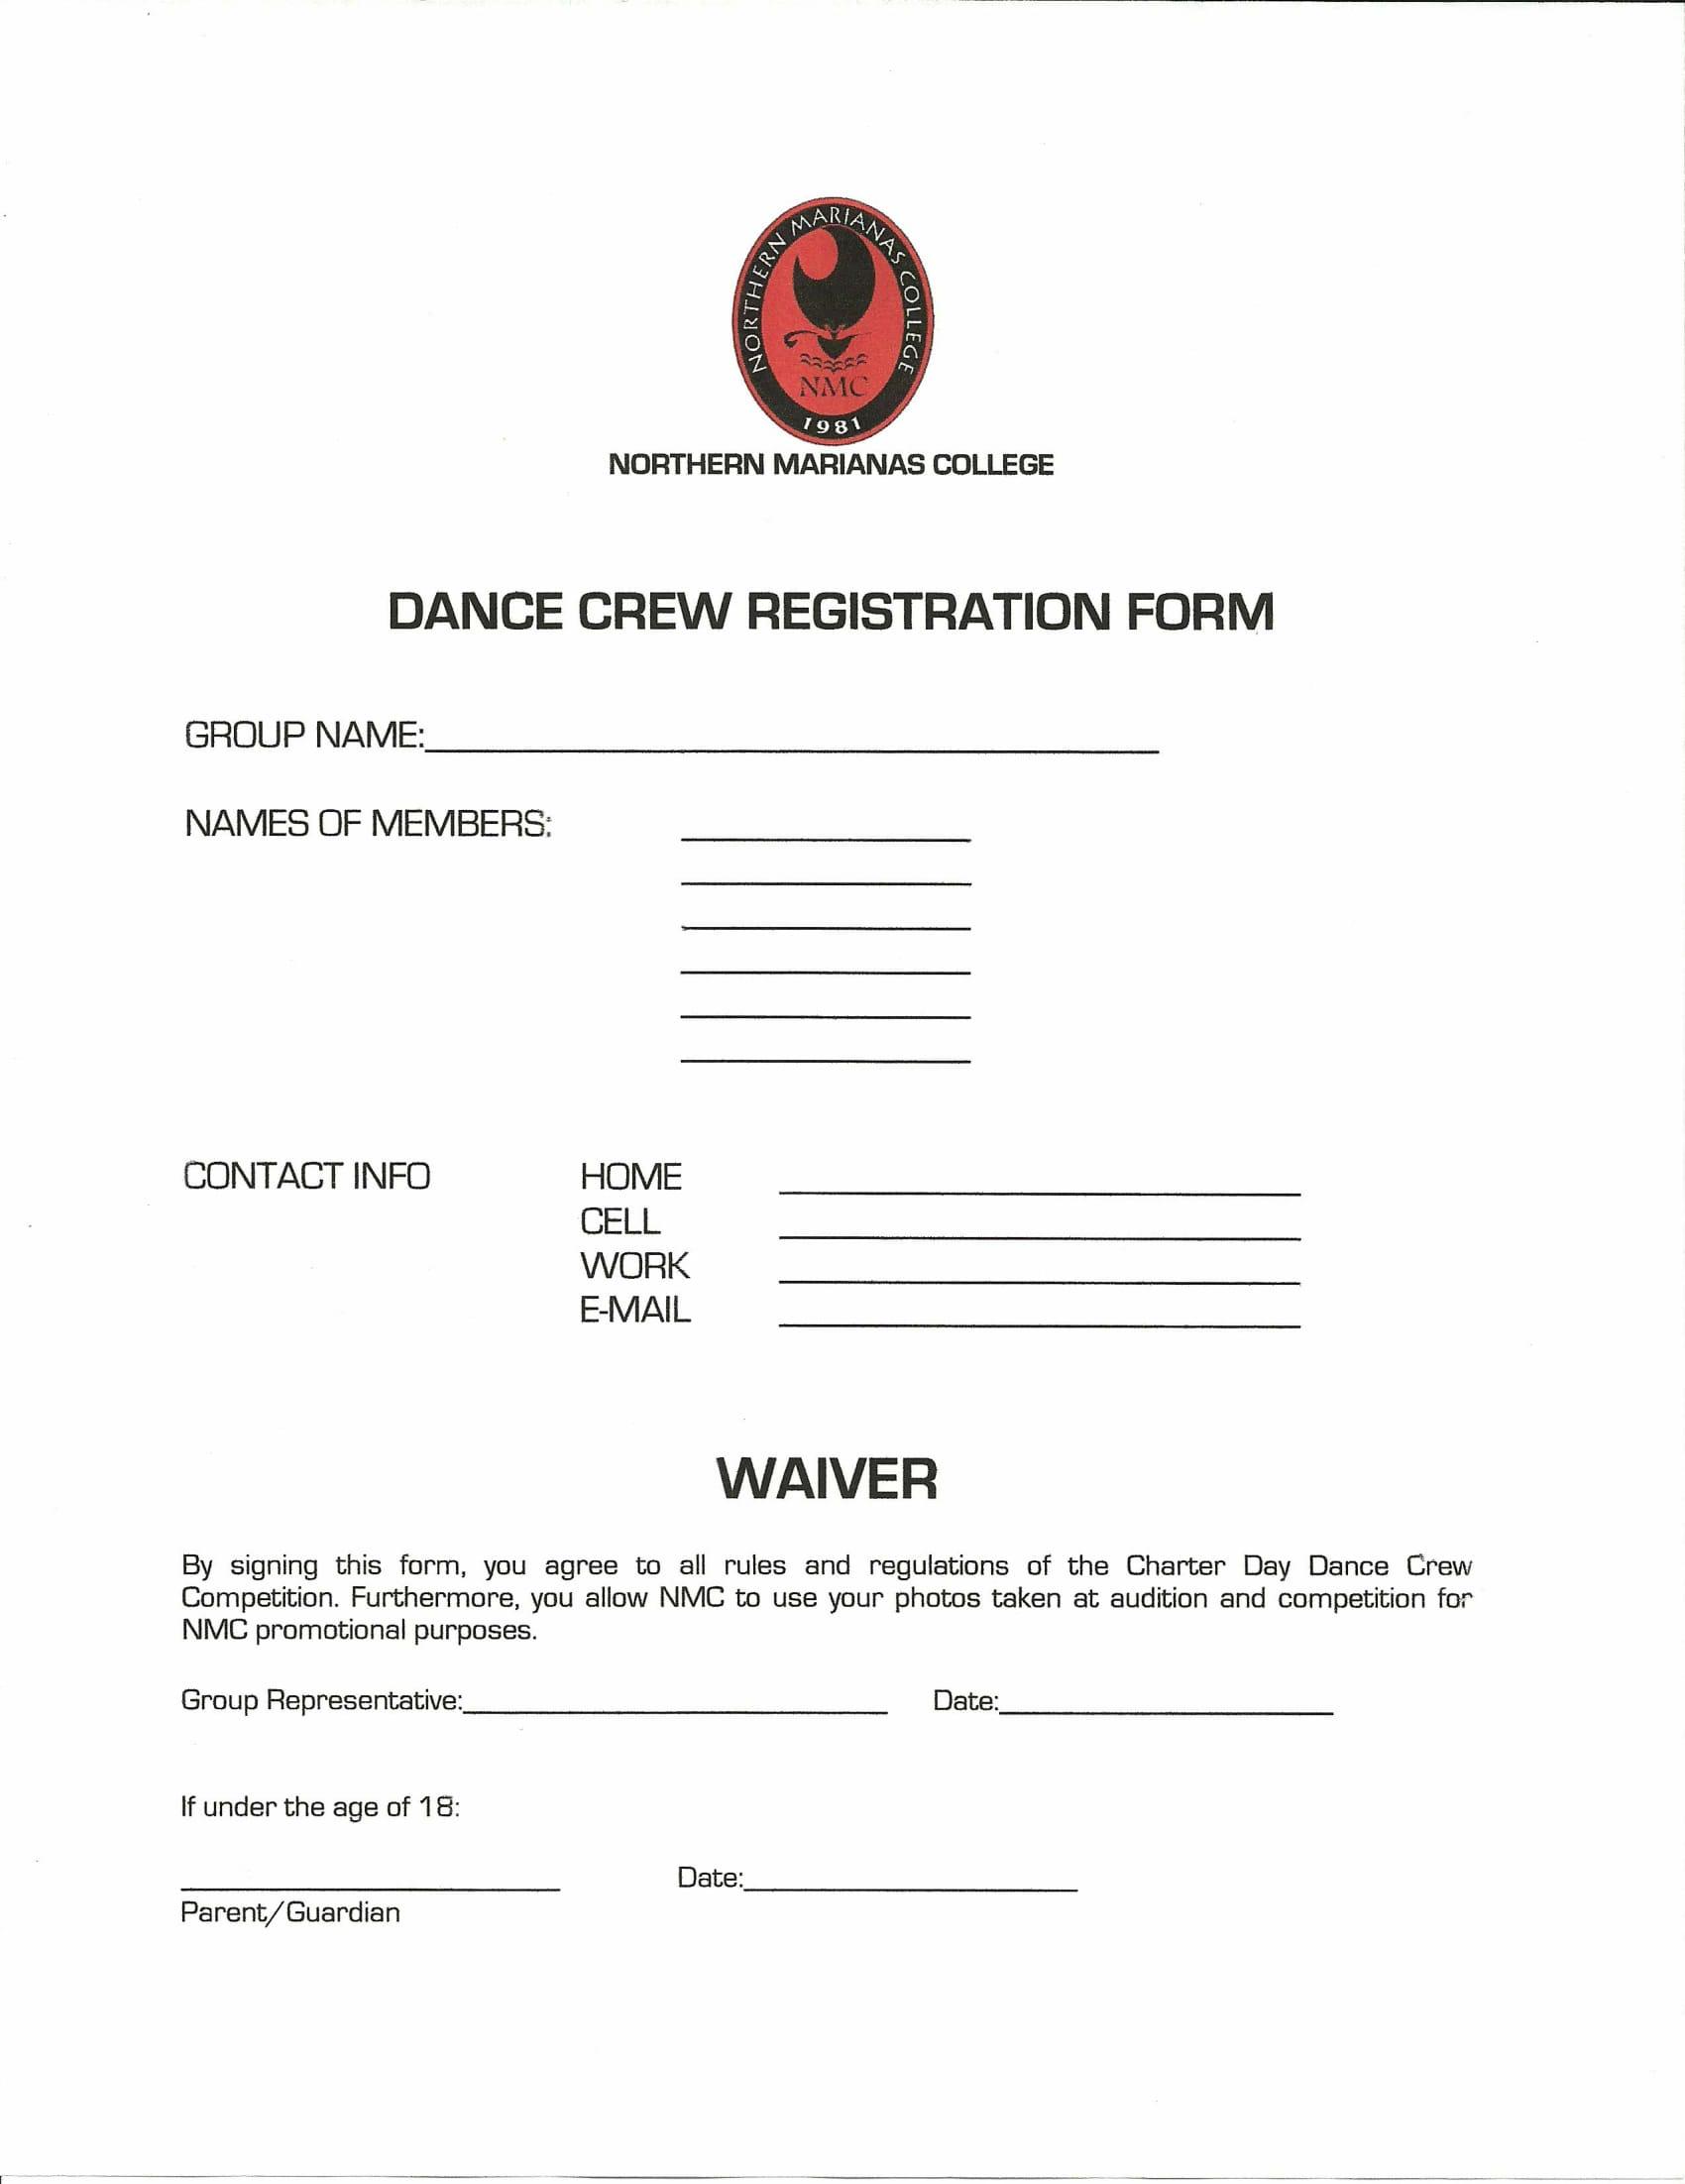 dance crew registration form 1